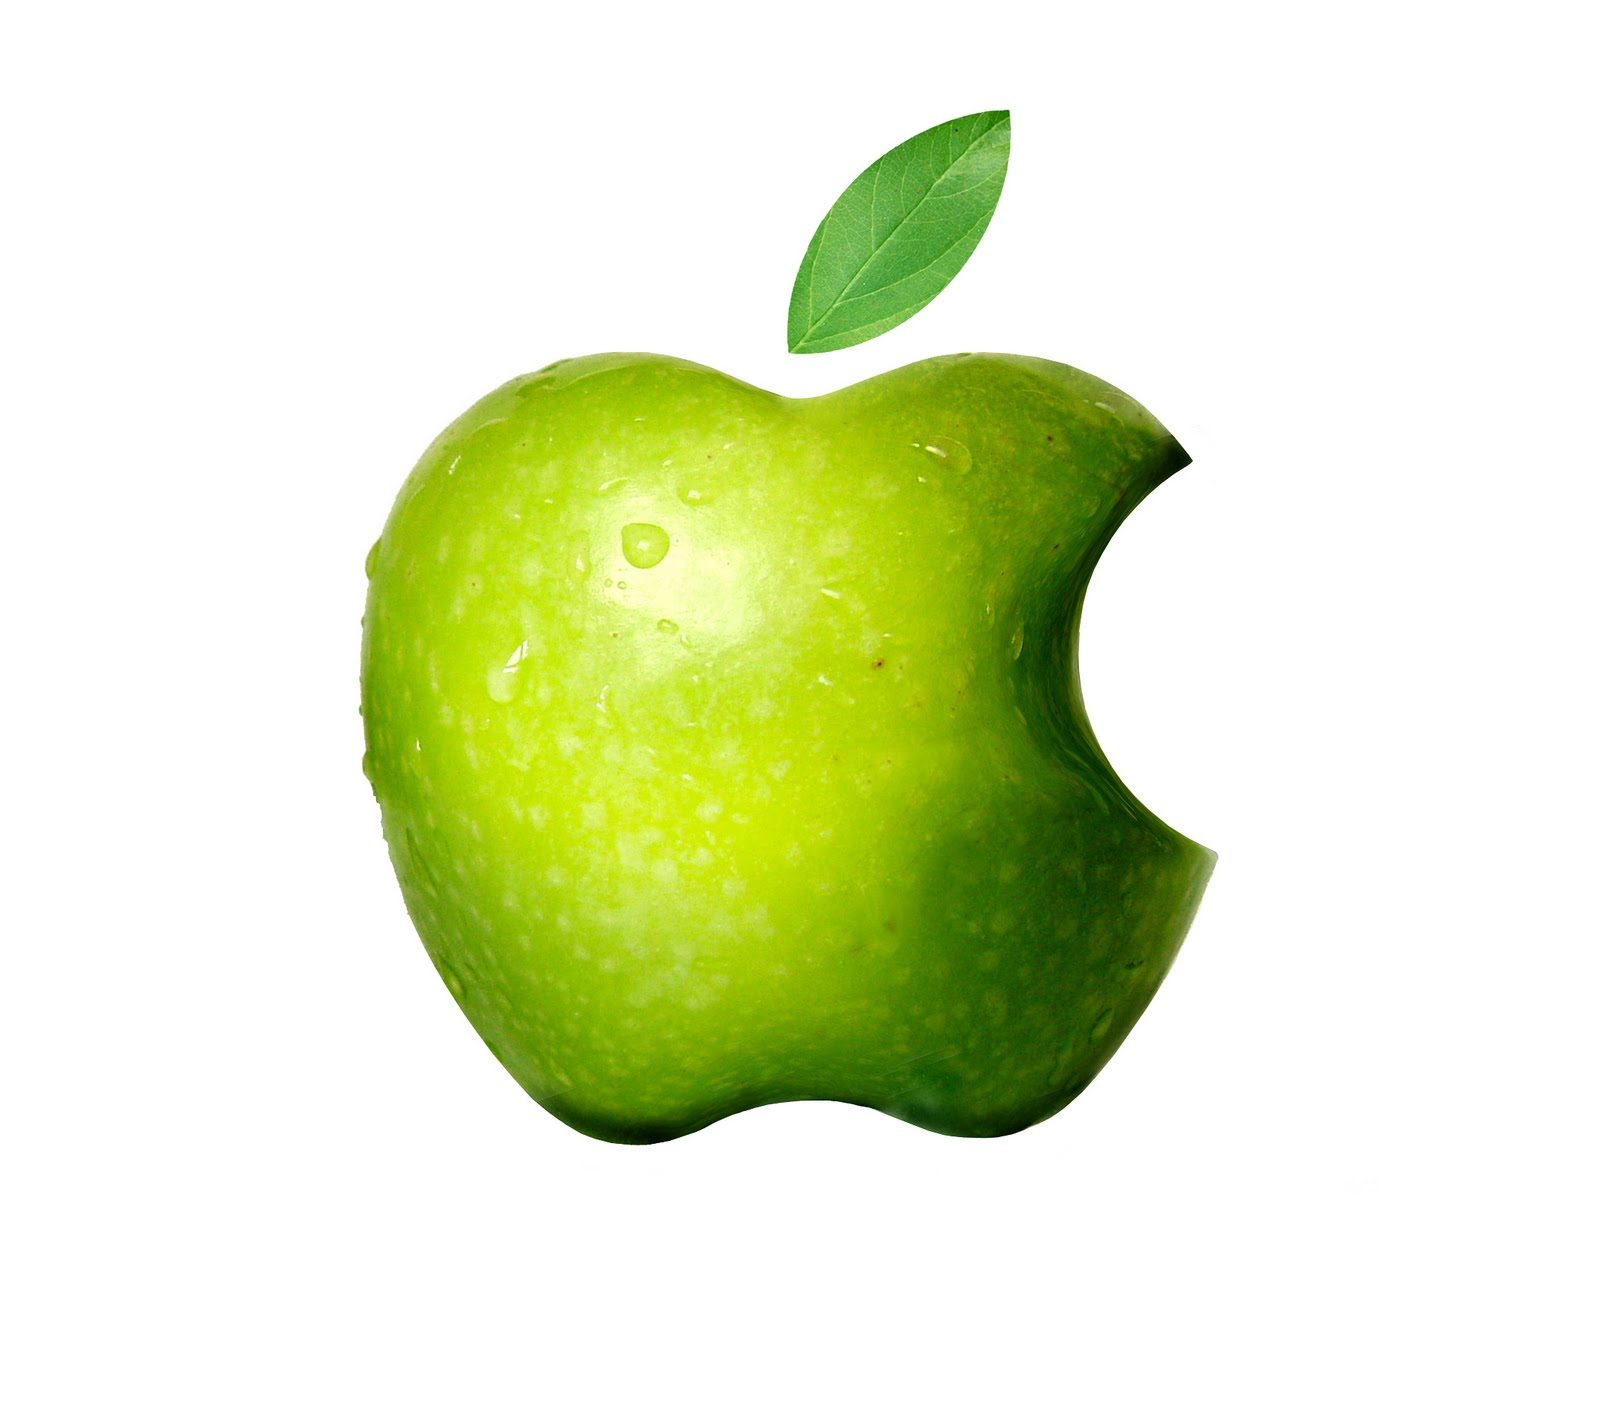 cr apple store: apple logo